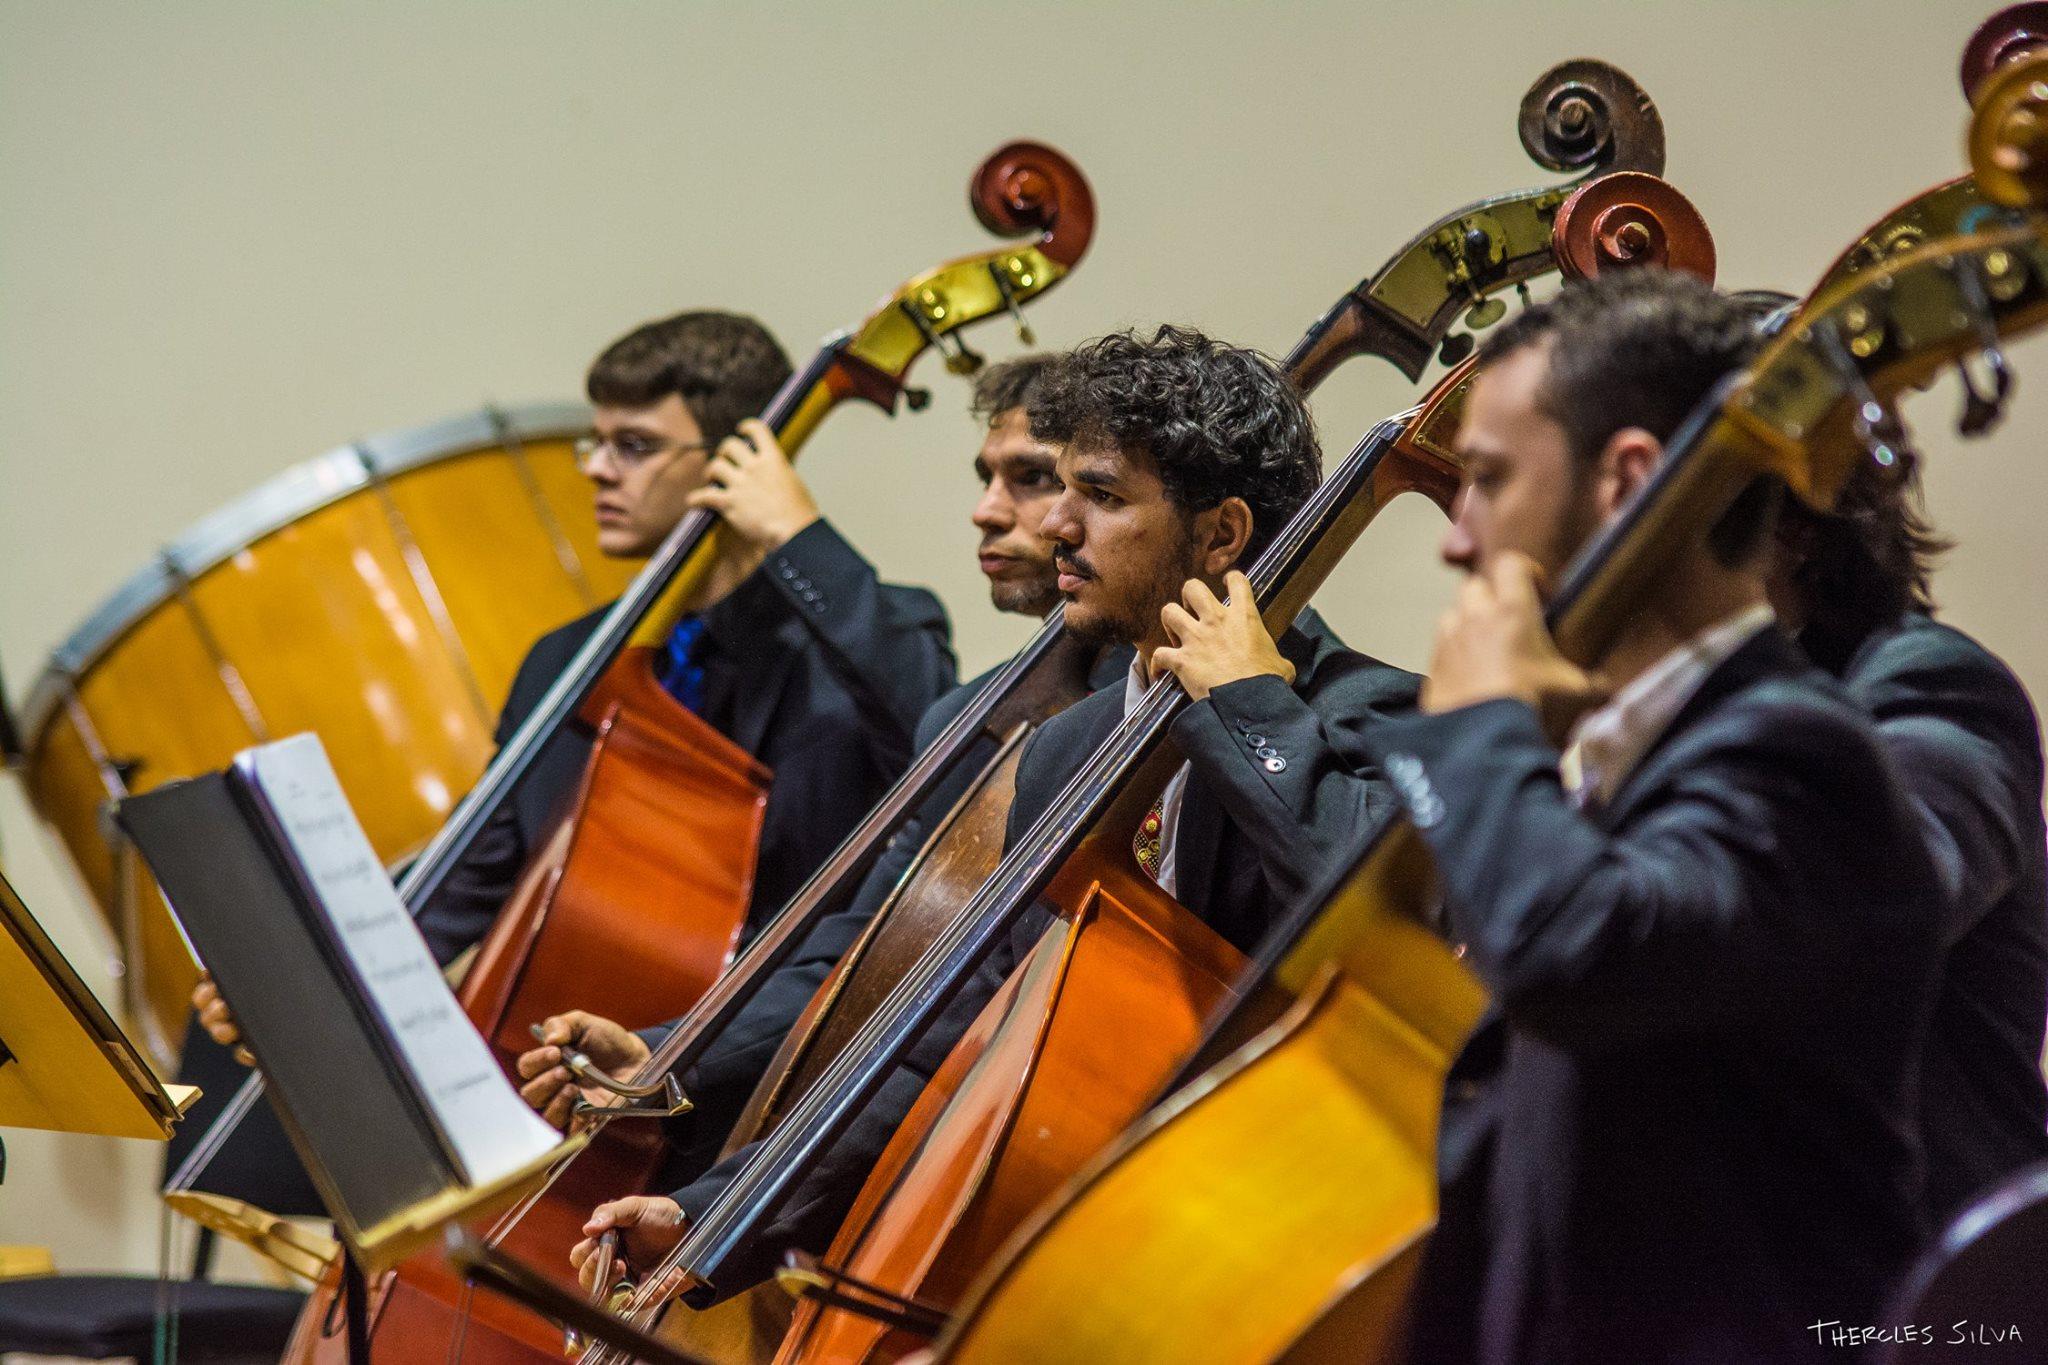 concerto osjpb 08.09.16_thercles silva (13) (1)